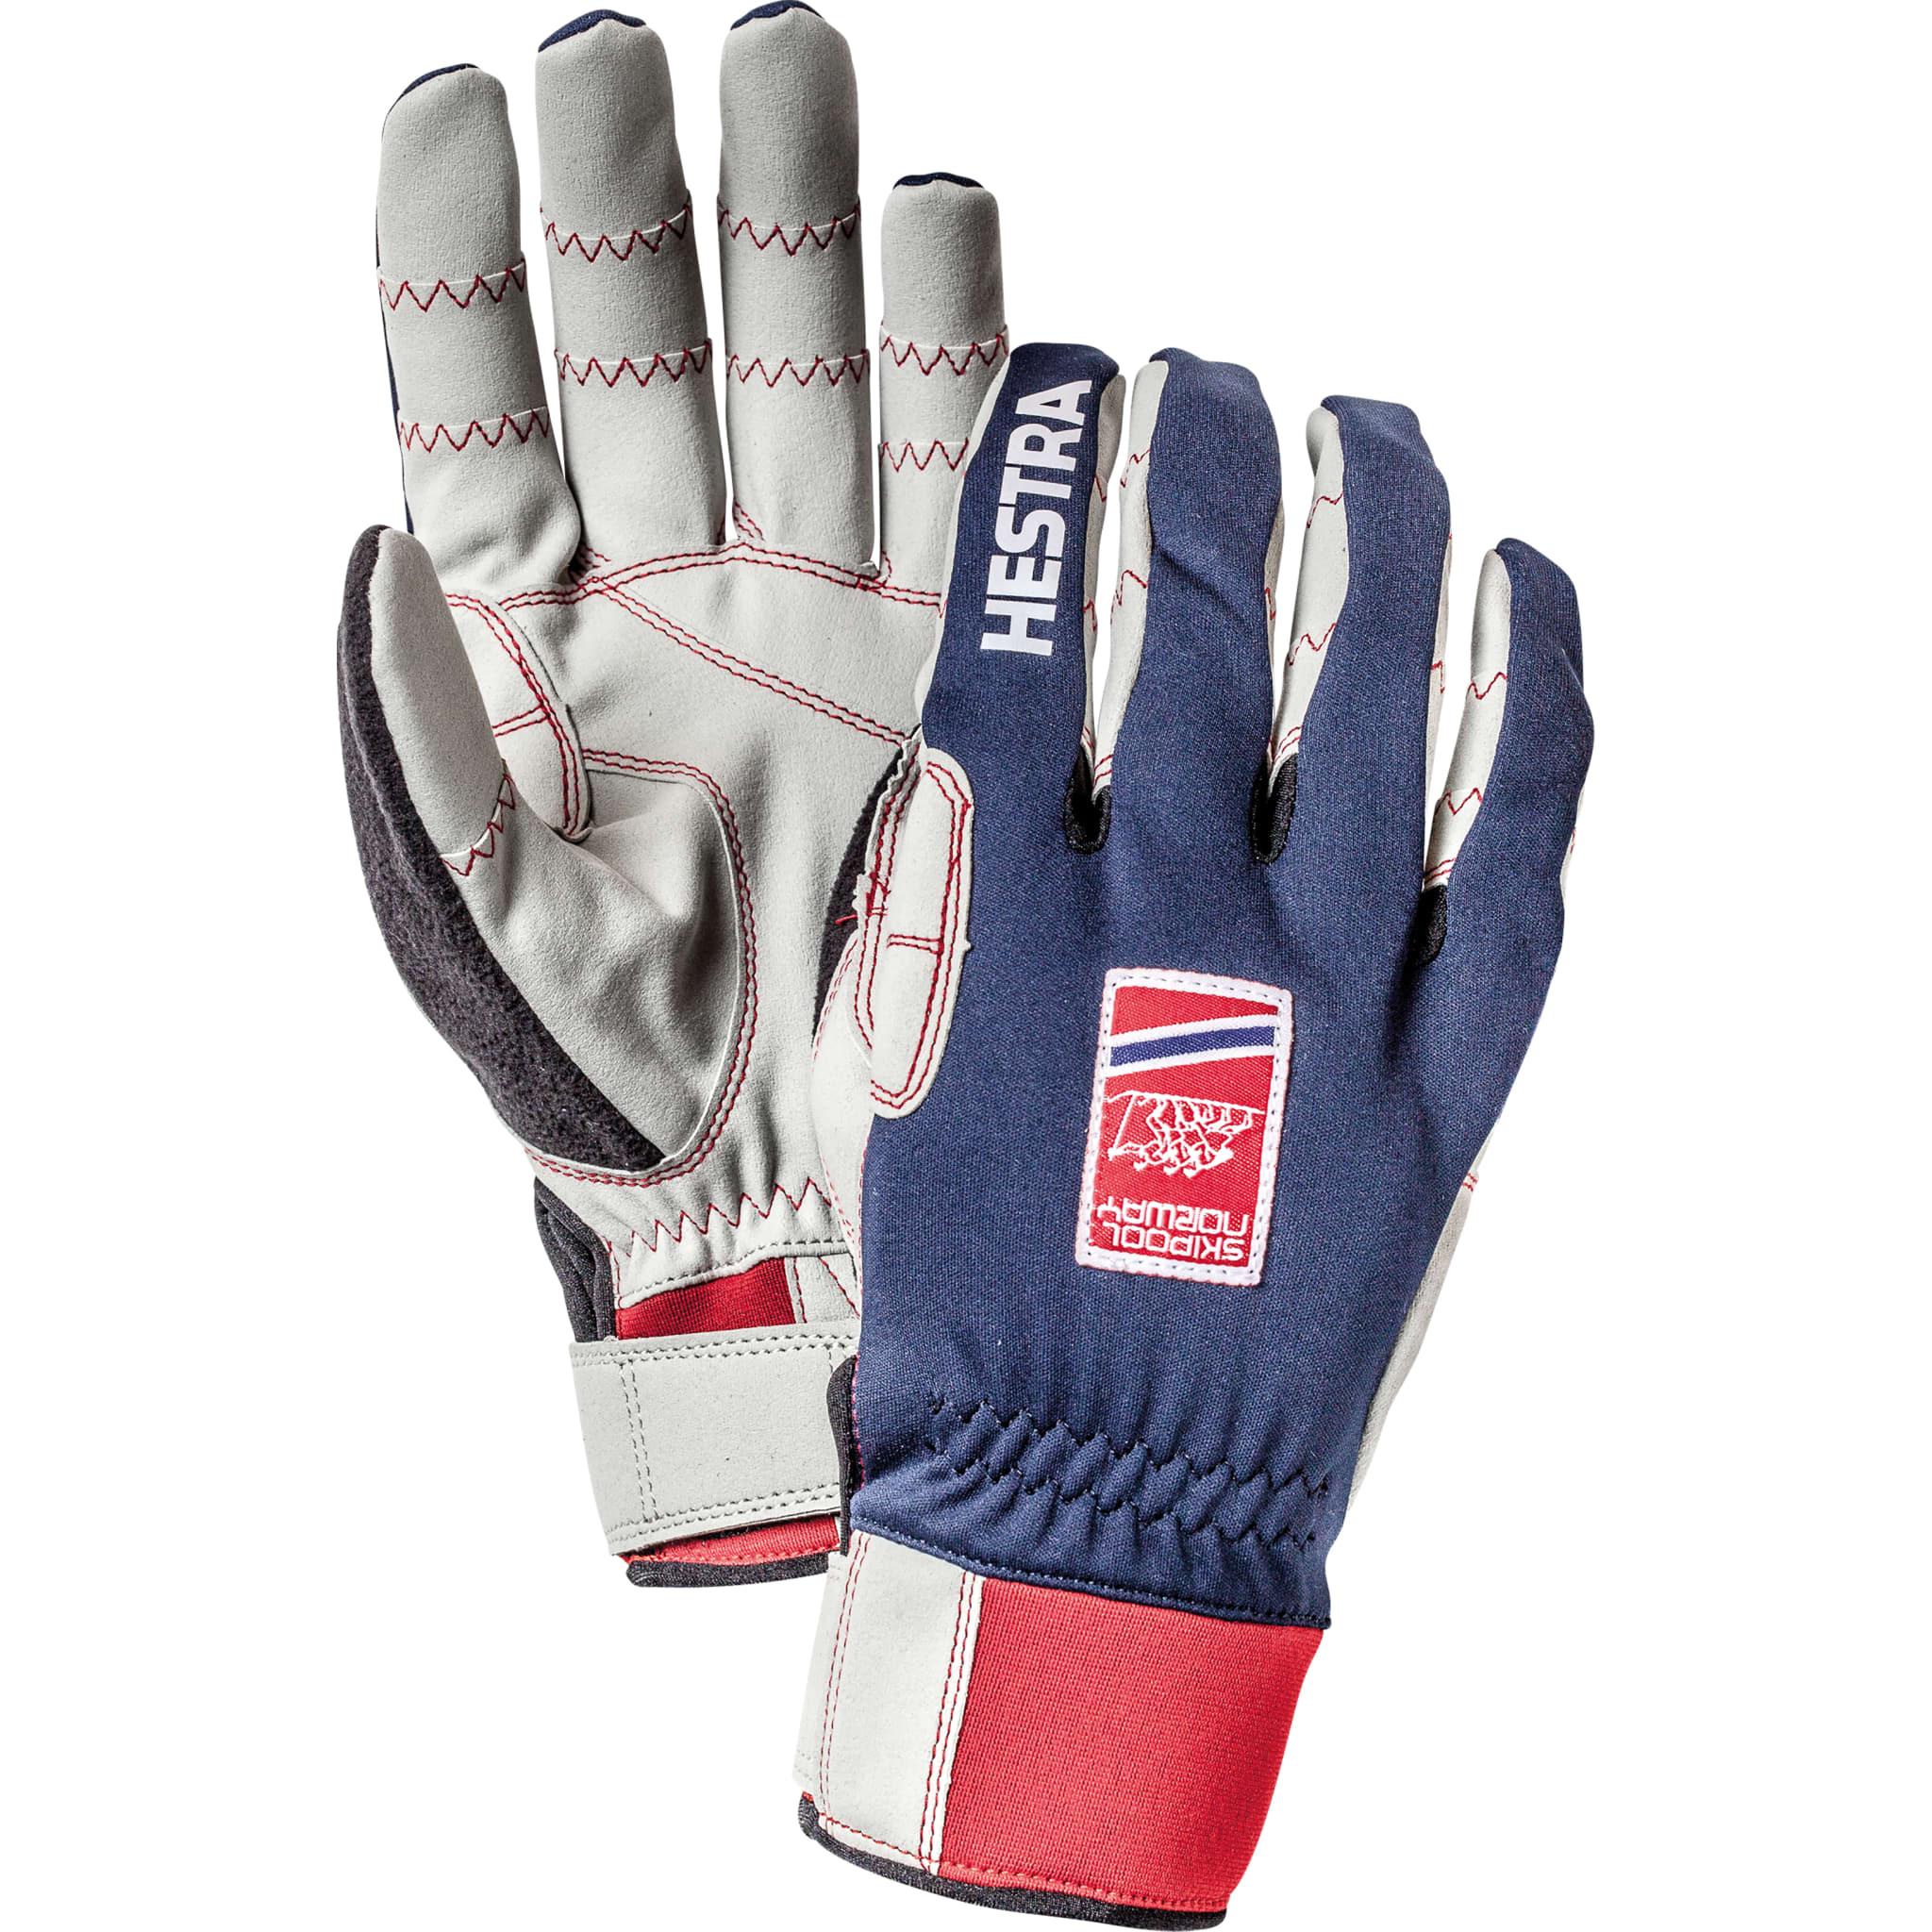 Ergo Grip Windstopper Race Gloves